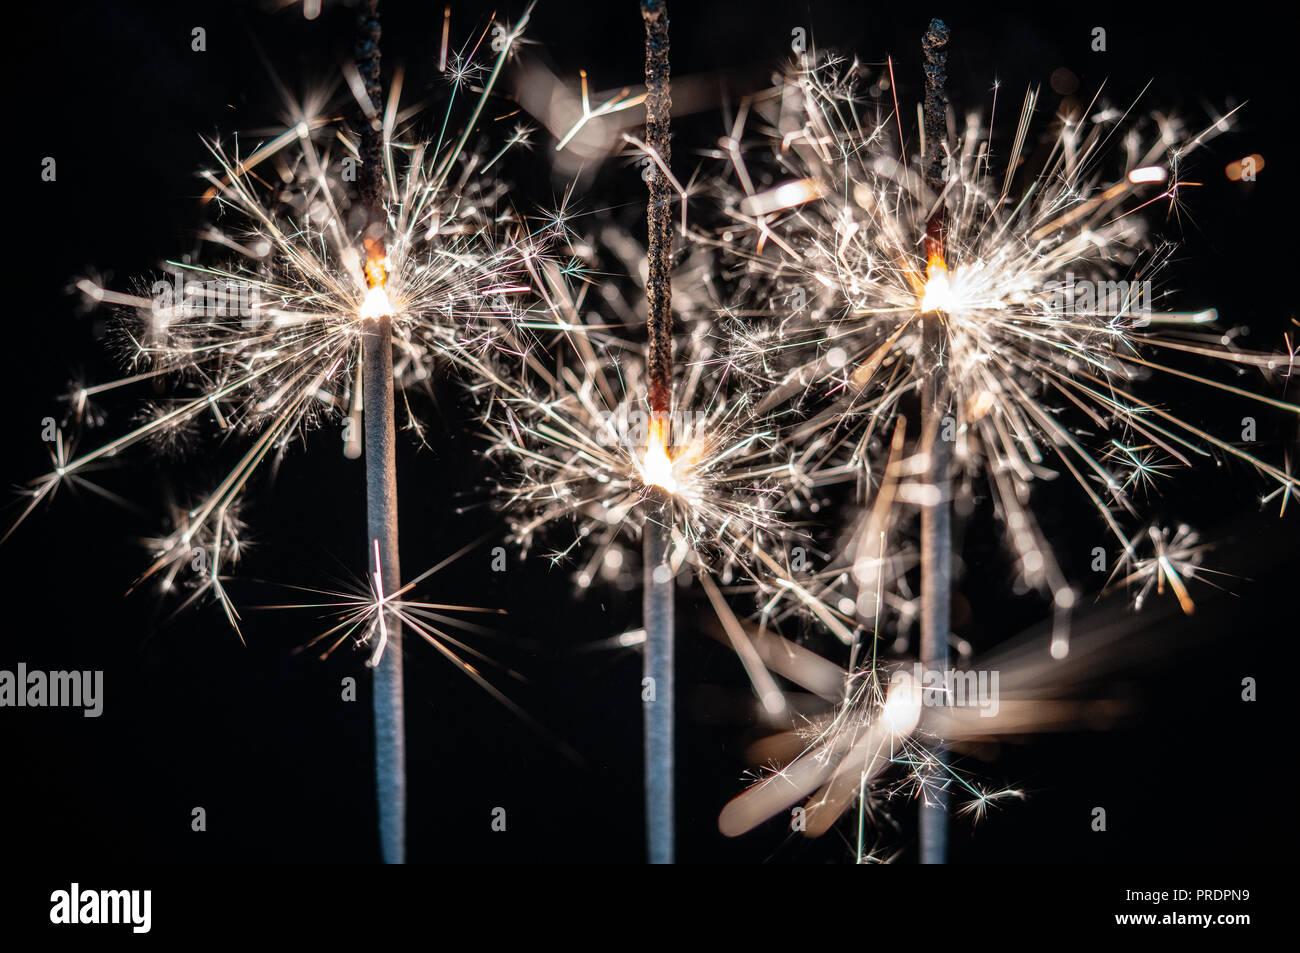 Fireworks , estrellitas ,revienta contra un fondo negro Foto de stock